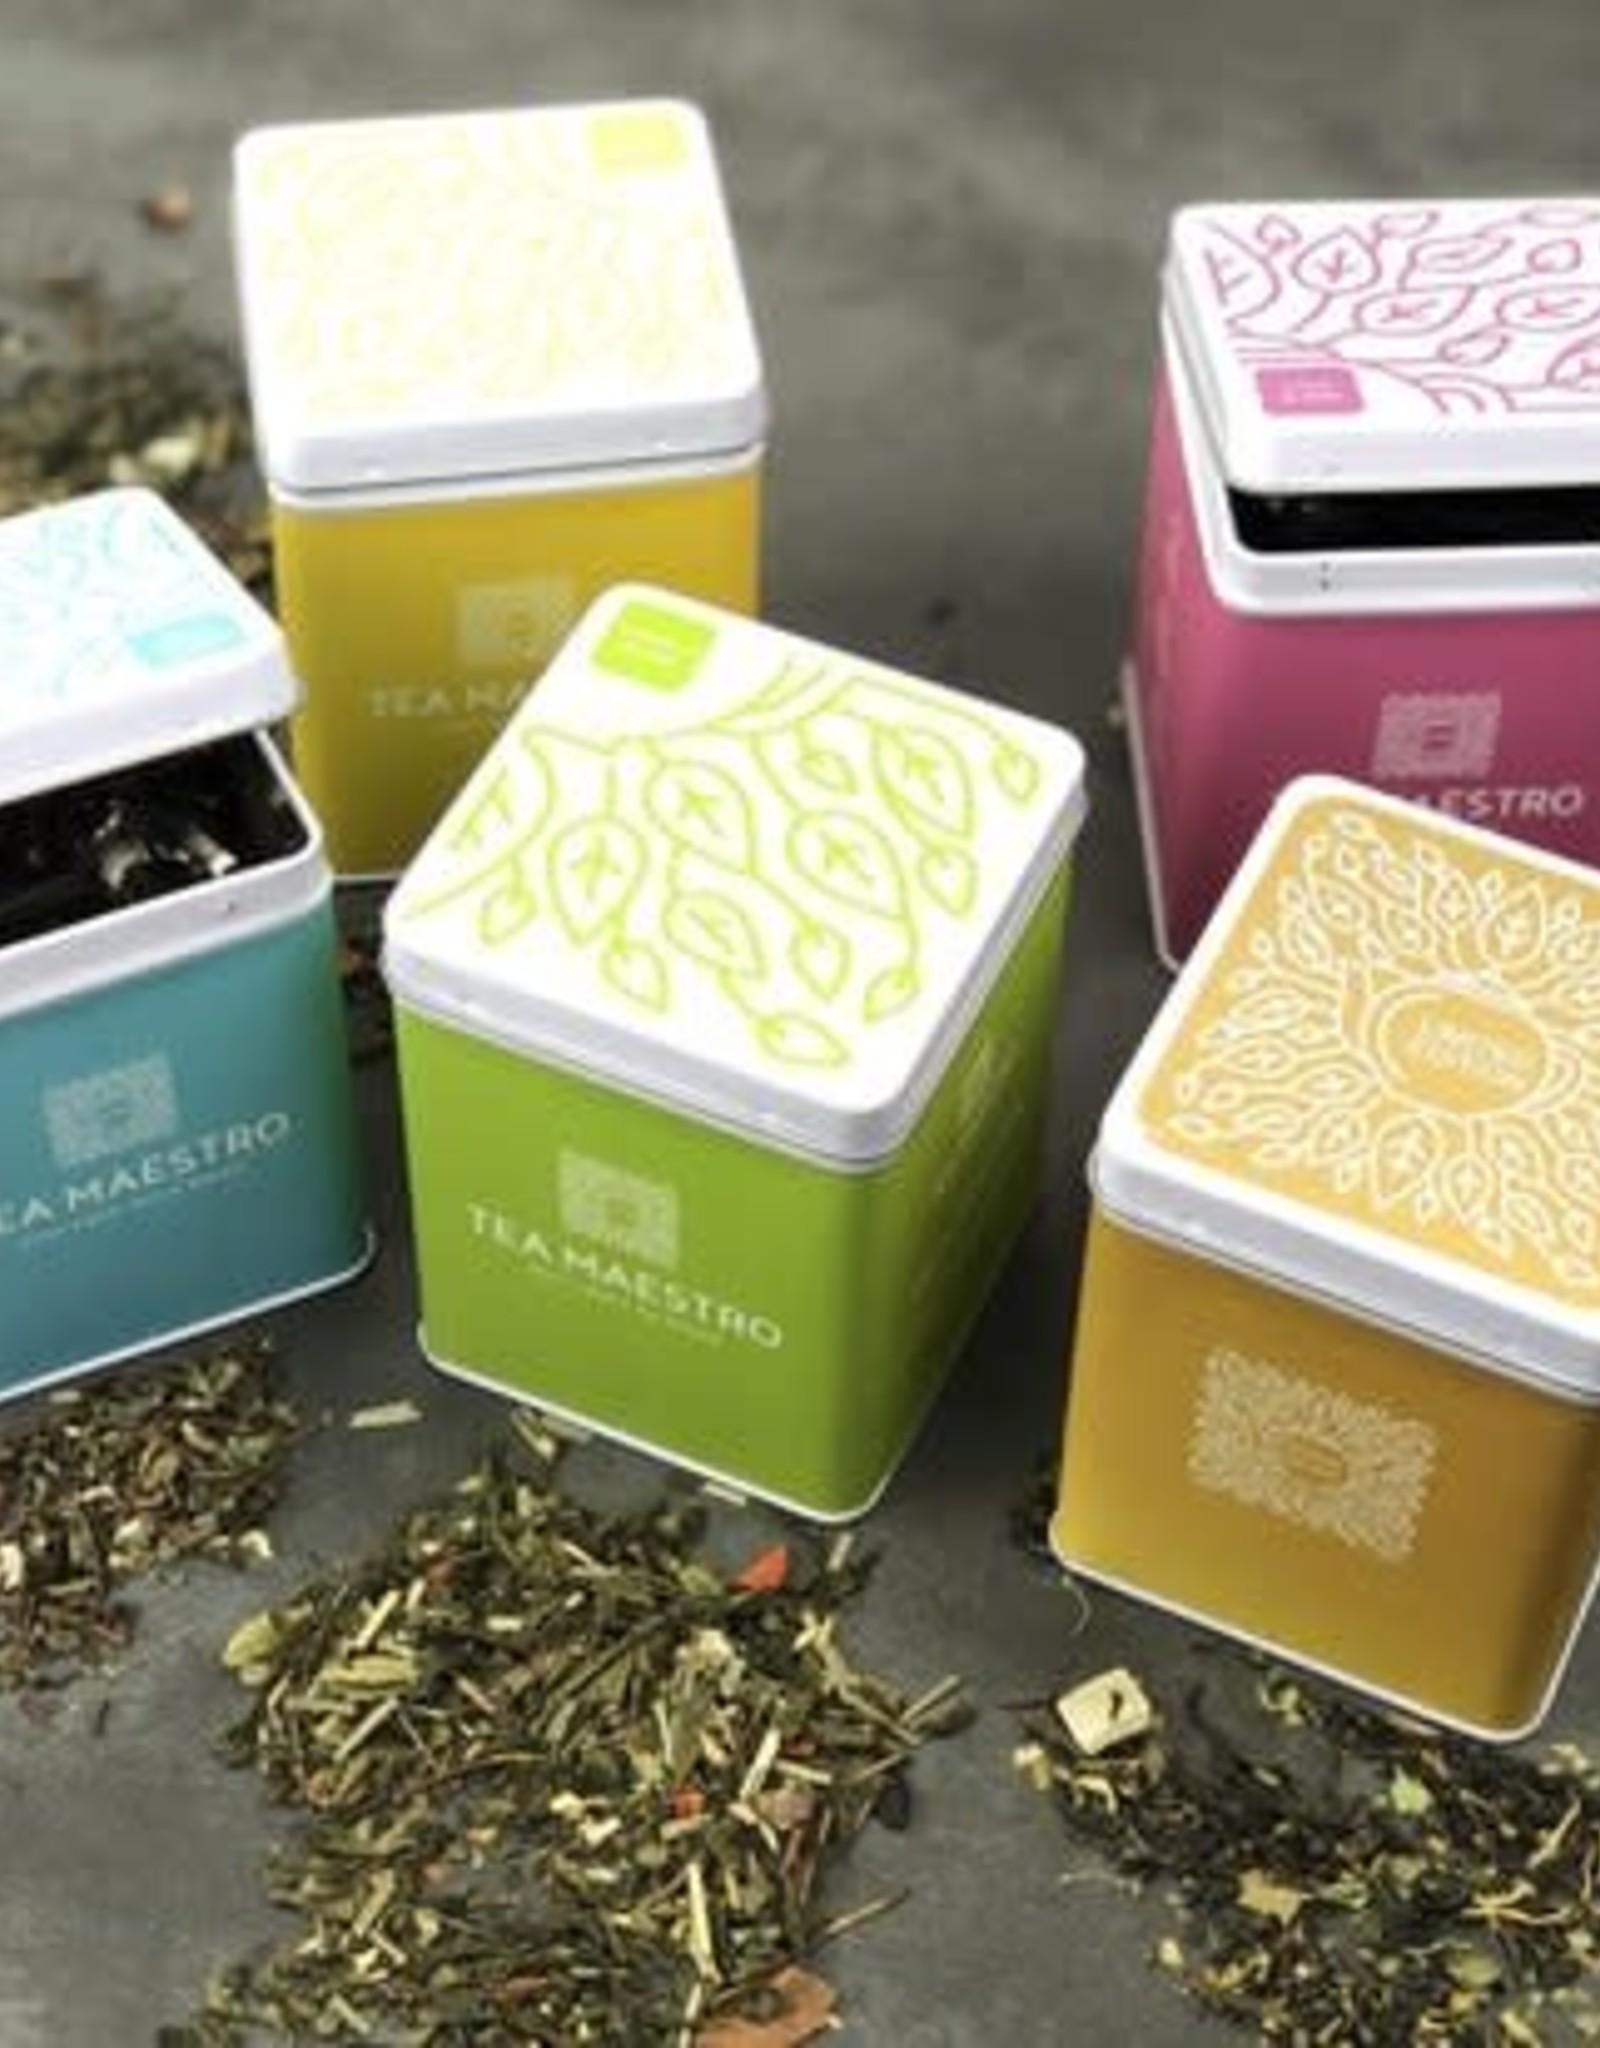 Dutch Tea Maestro Tea Feel Good - Blend in Blik 80 gr